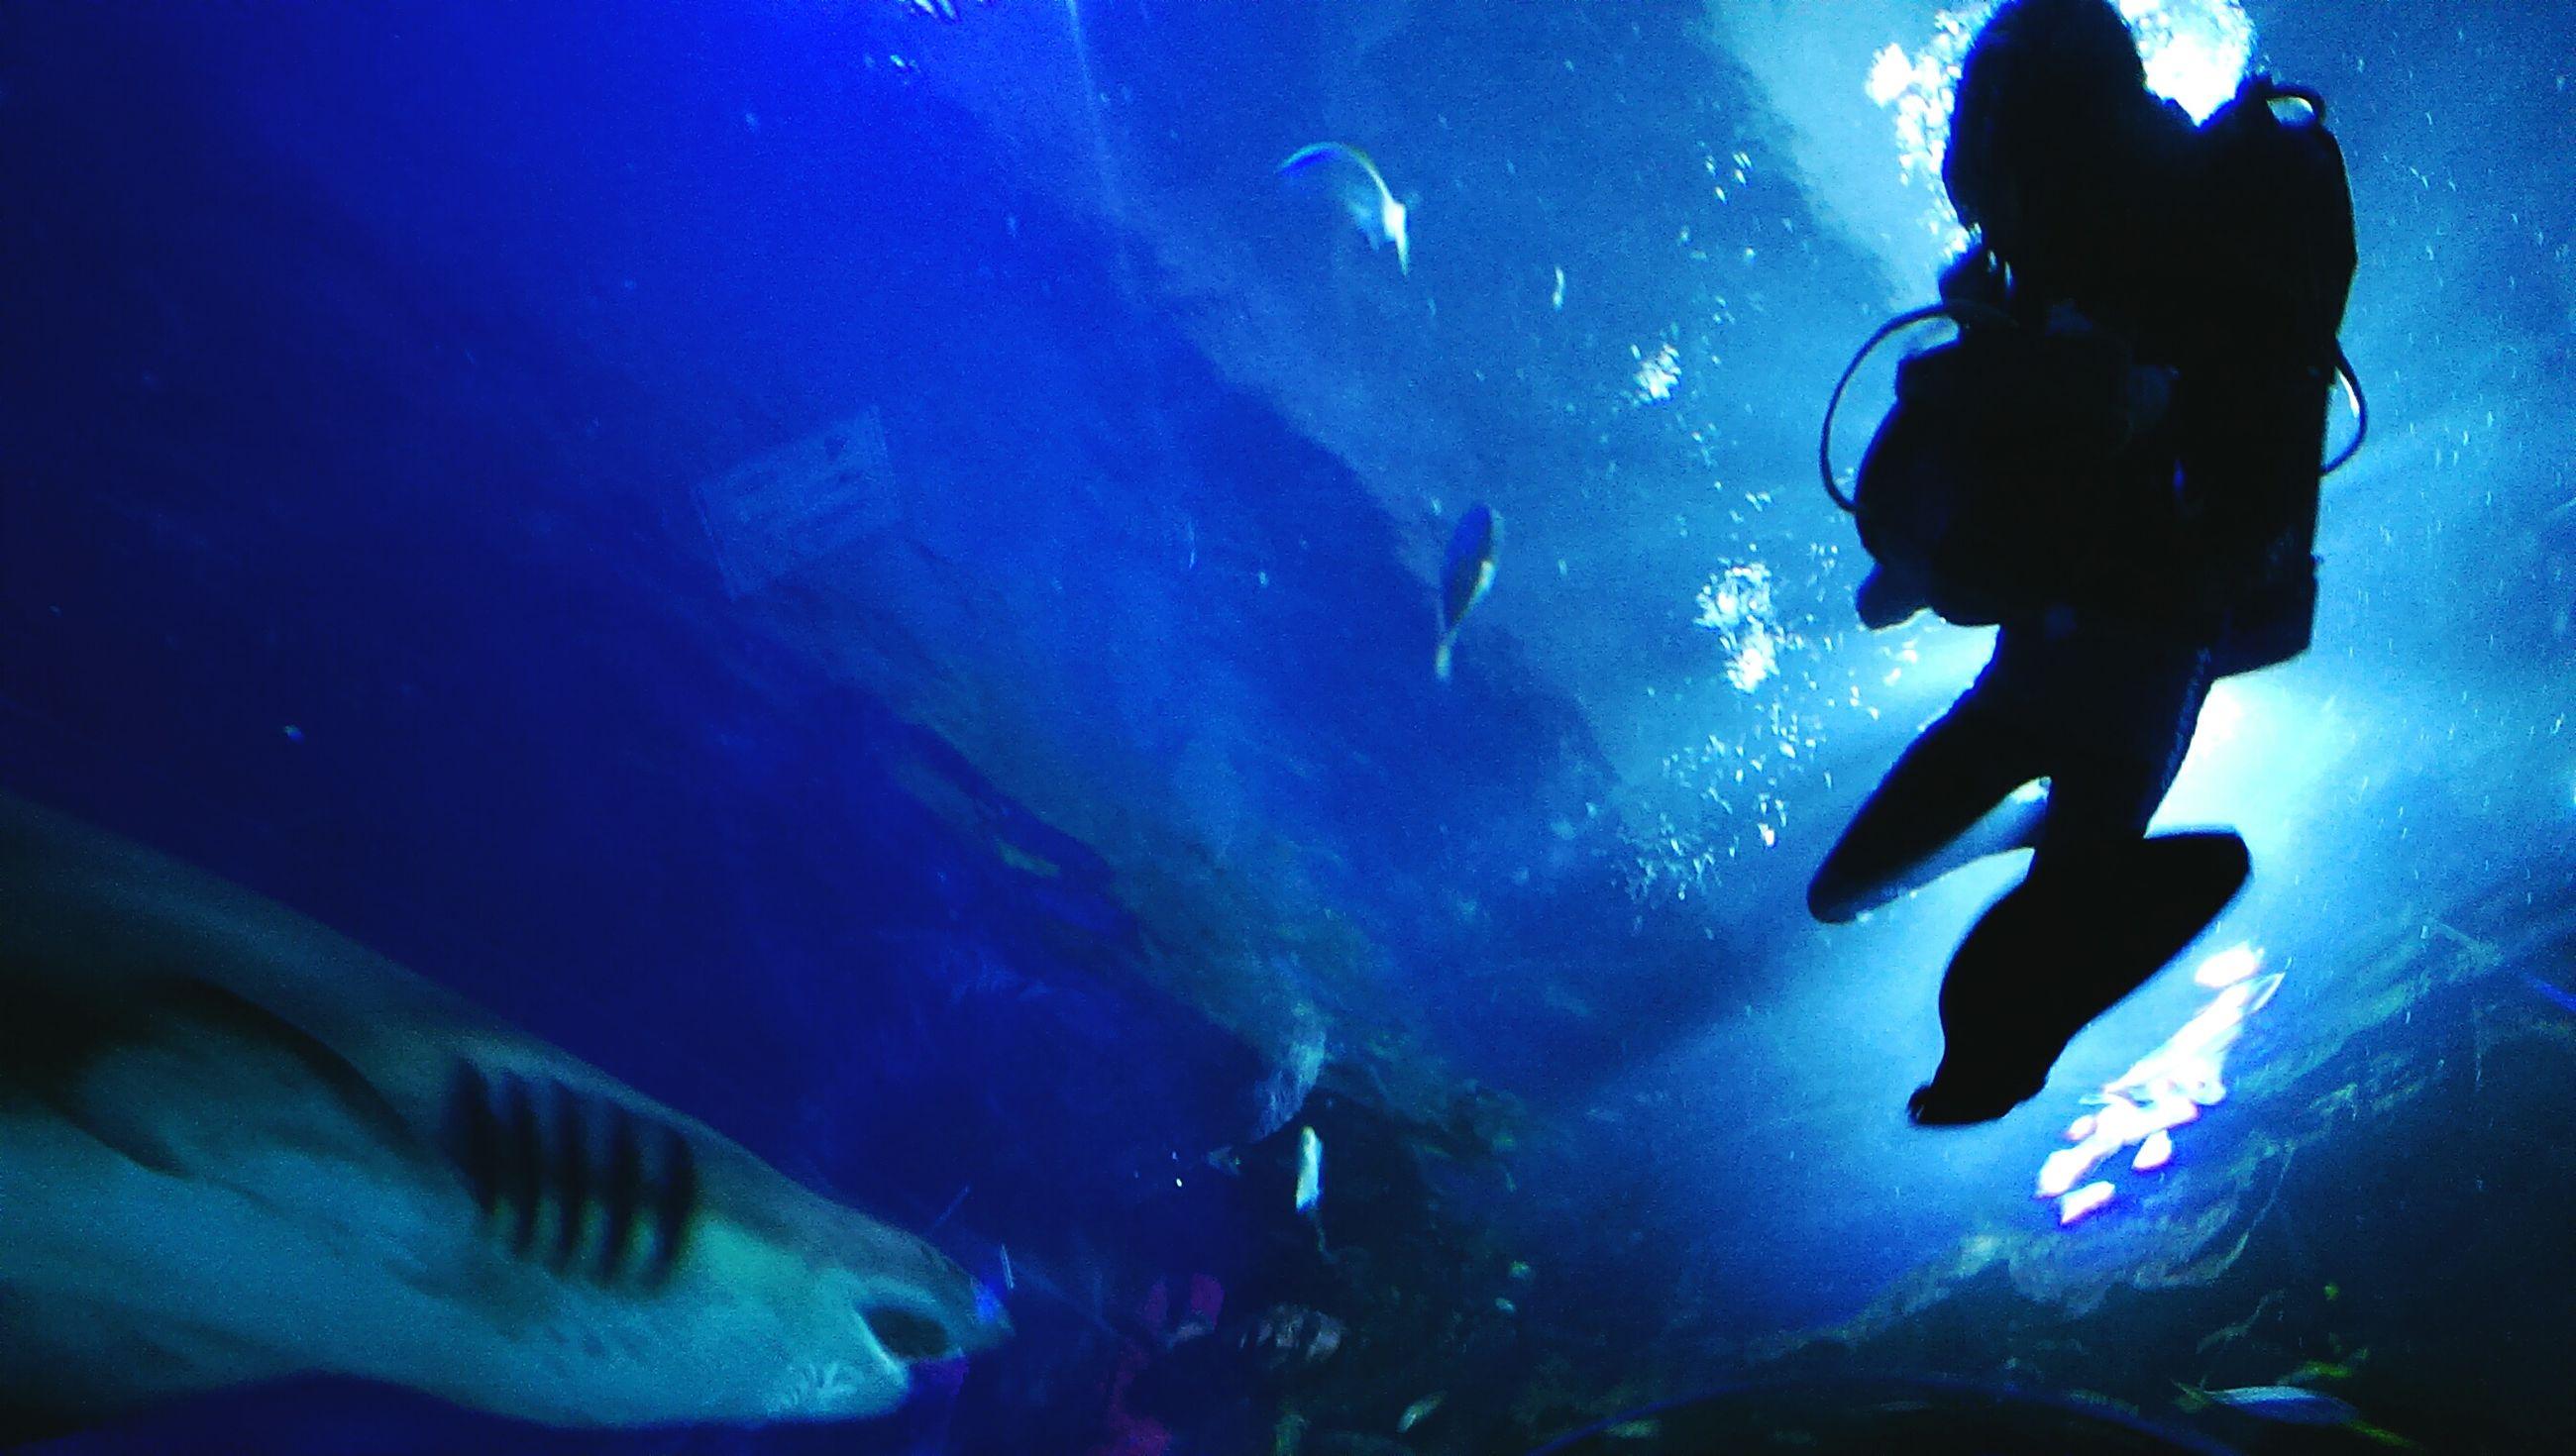 lifestyles, men, leisure activity, underwater, blue, silhouette, indoors, enjoyment, water, illuminated, night, undersea, person, fun, togetherness, swimming, aquarium, unrecognizable person